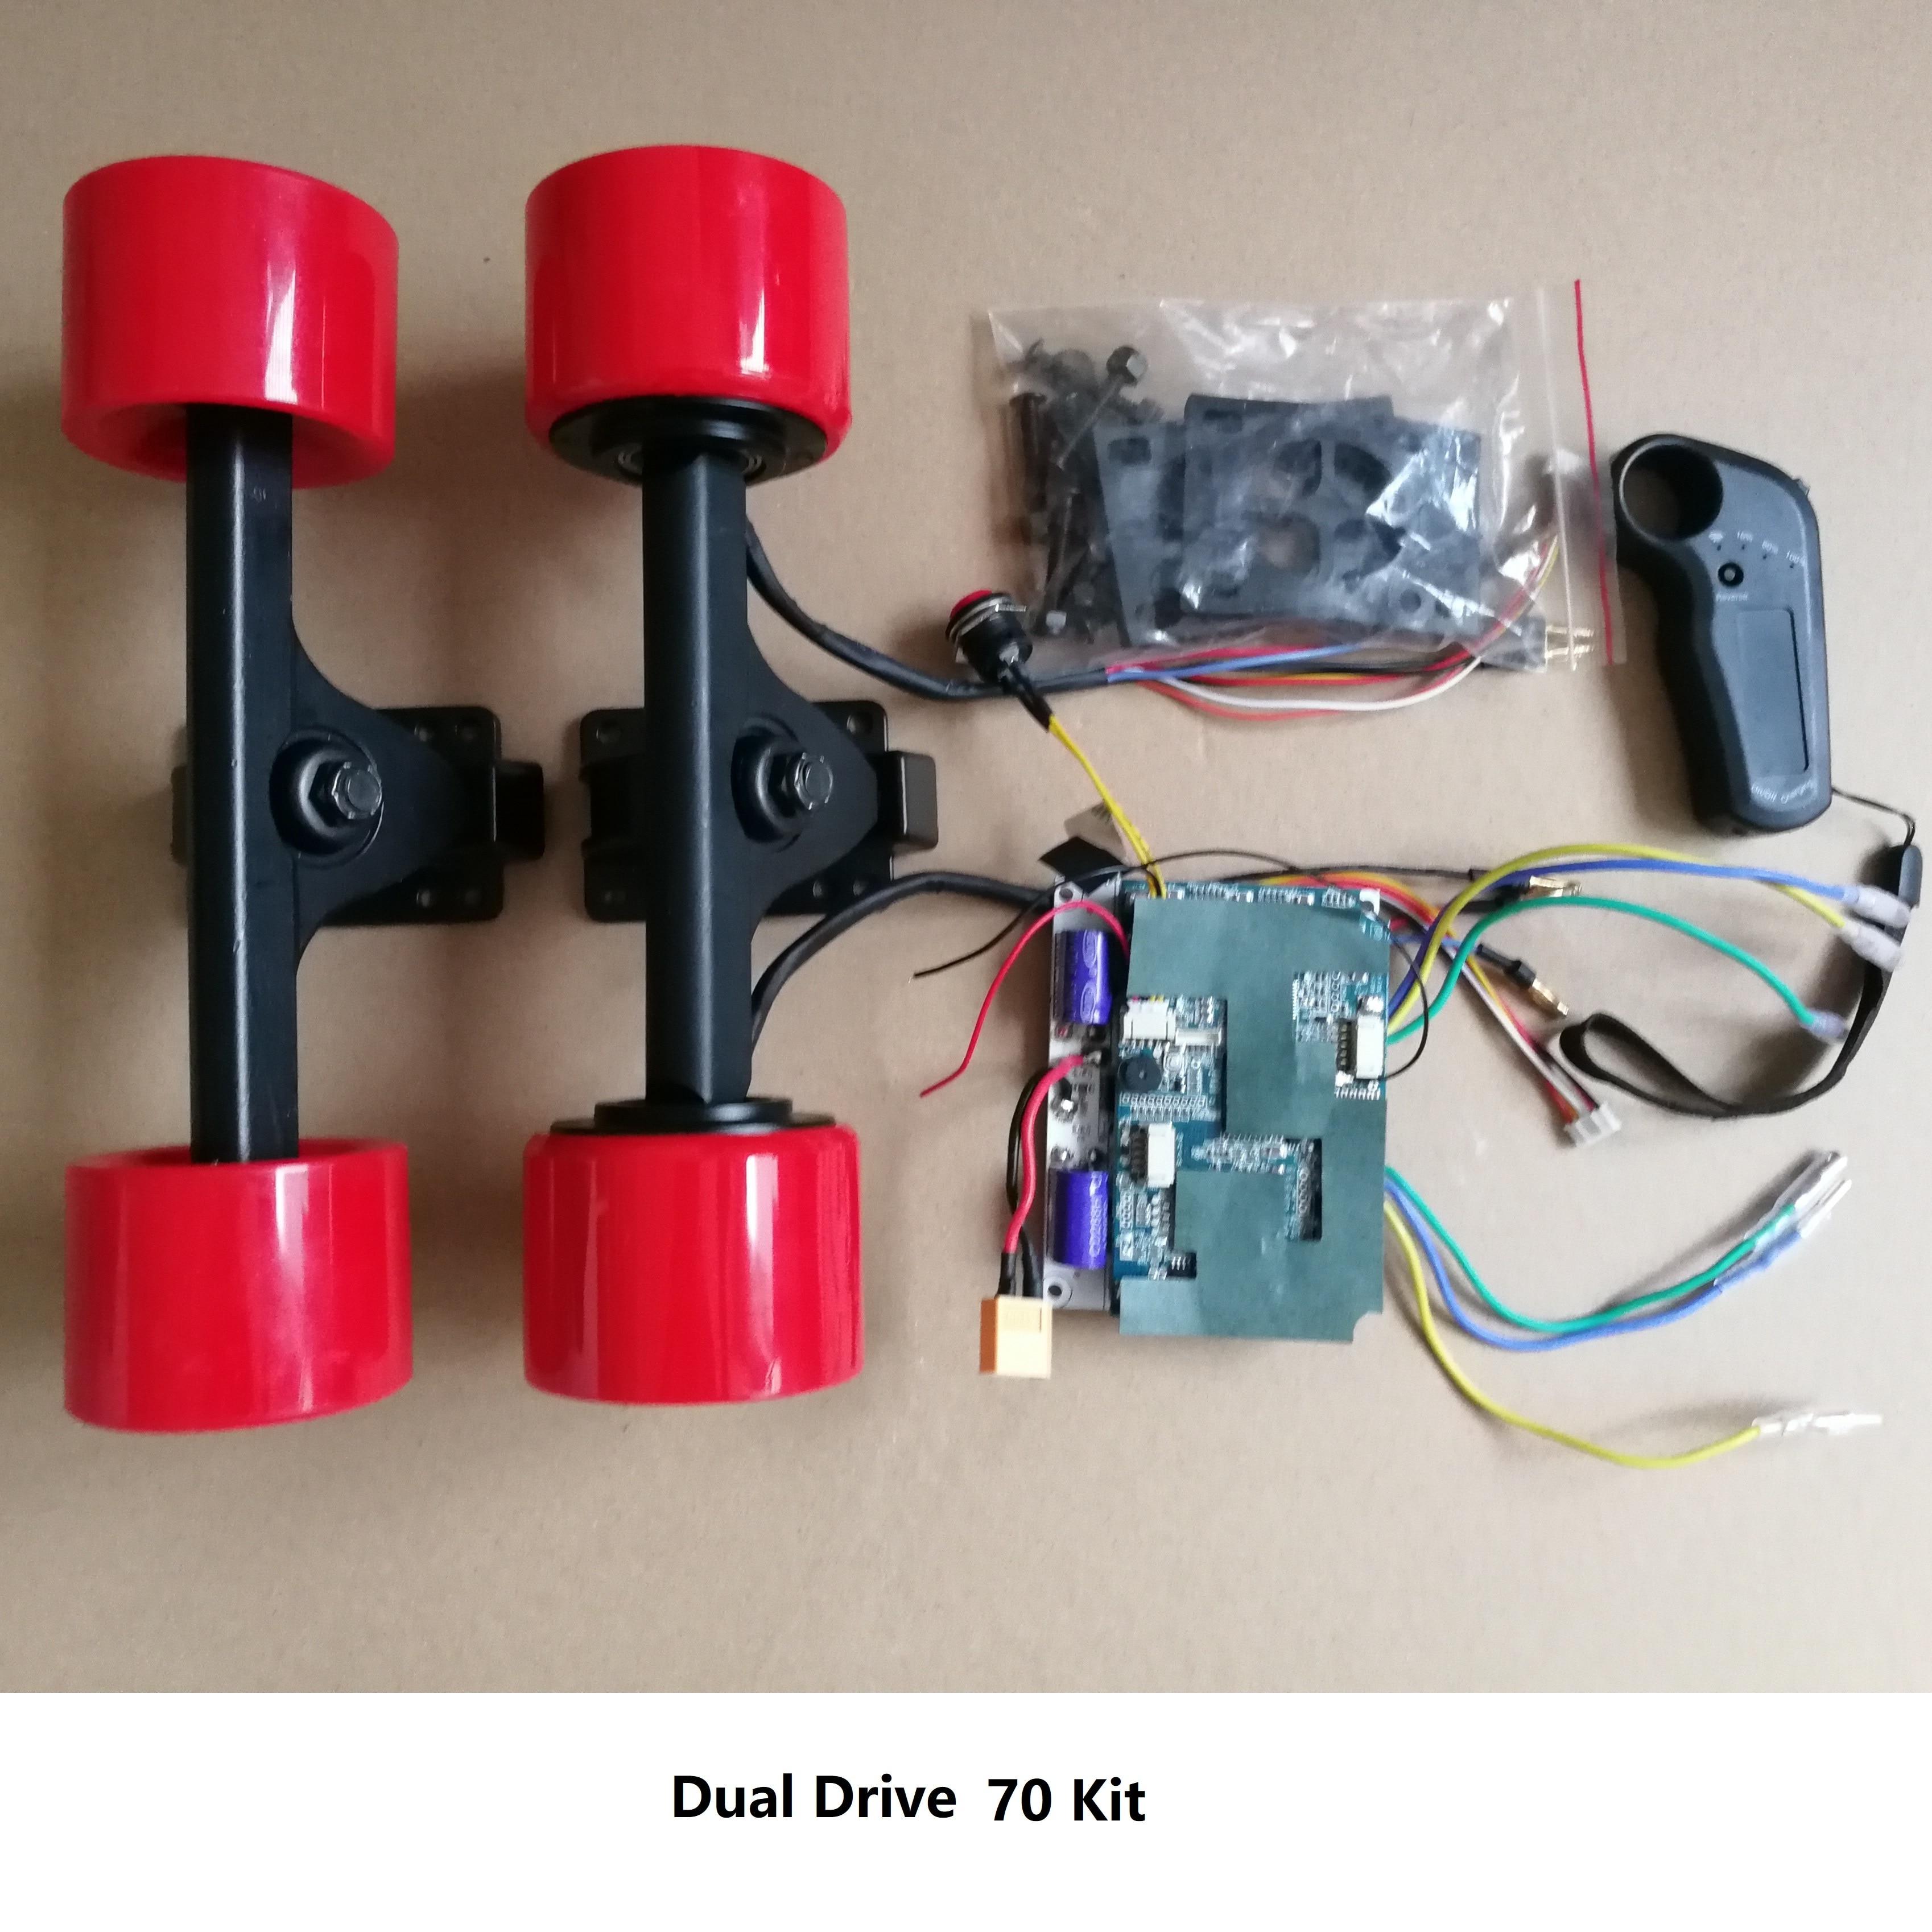 24v 36v BLDC 70 83 mm eléctrico de Control remoto patineta Longboard DIY kit de Mini Motor eléctrico equipaje rueda kit de bricolaje